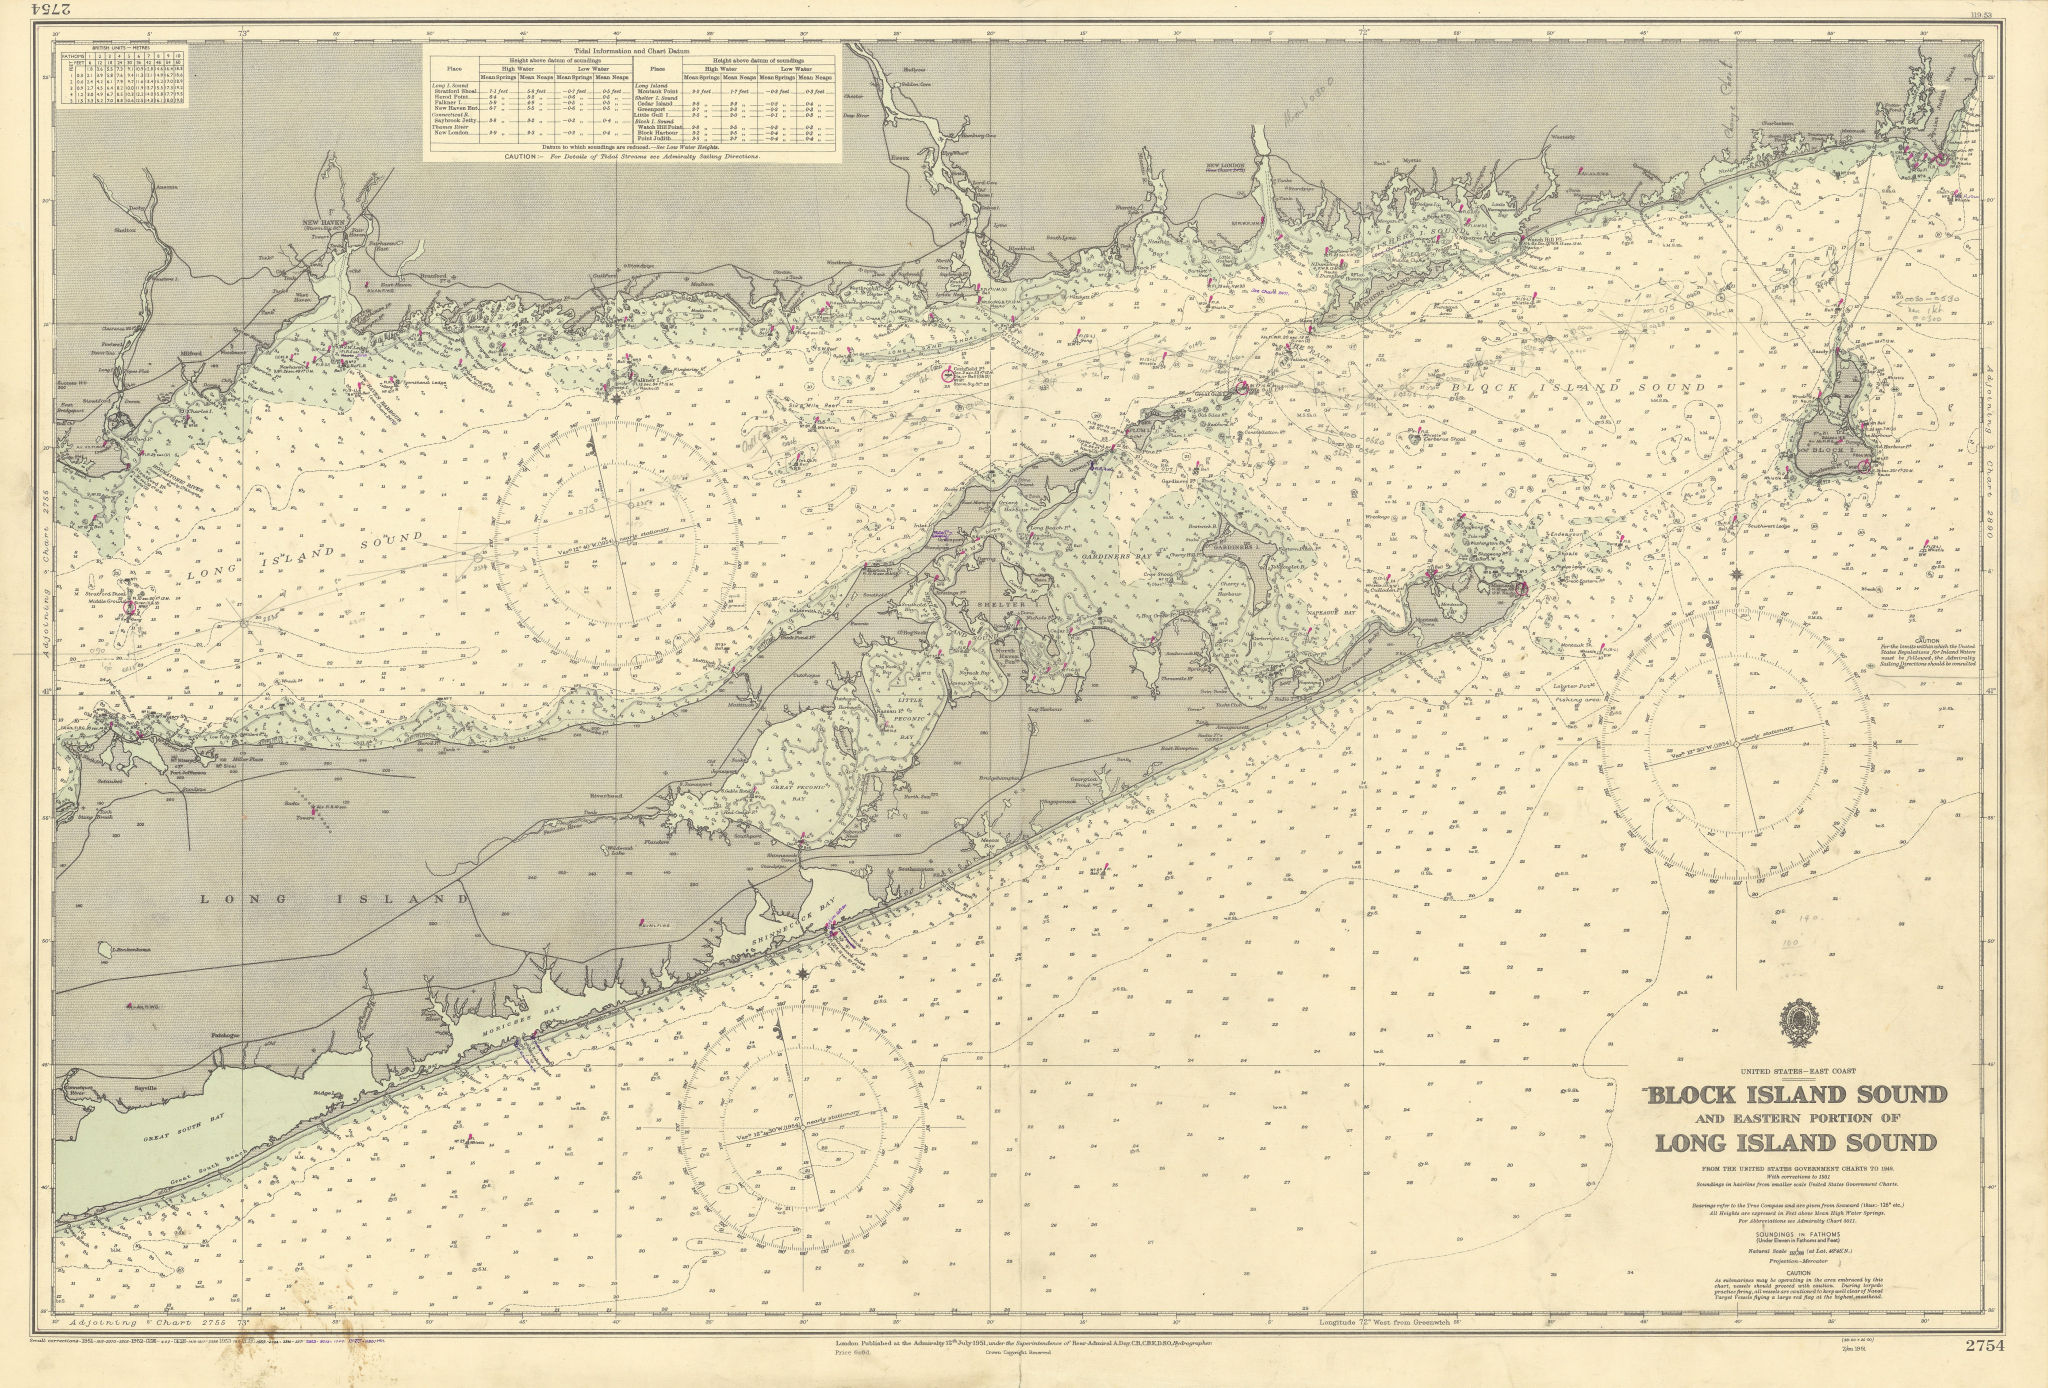 Long Island Block Island Sound Connecticut coast ADMIRALTY chart 1951 (1955) map